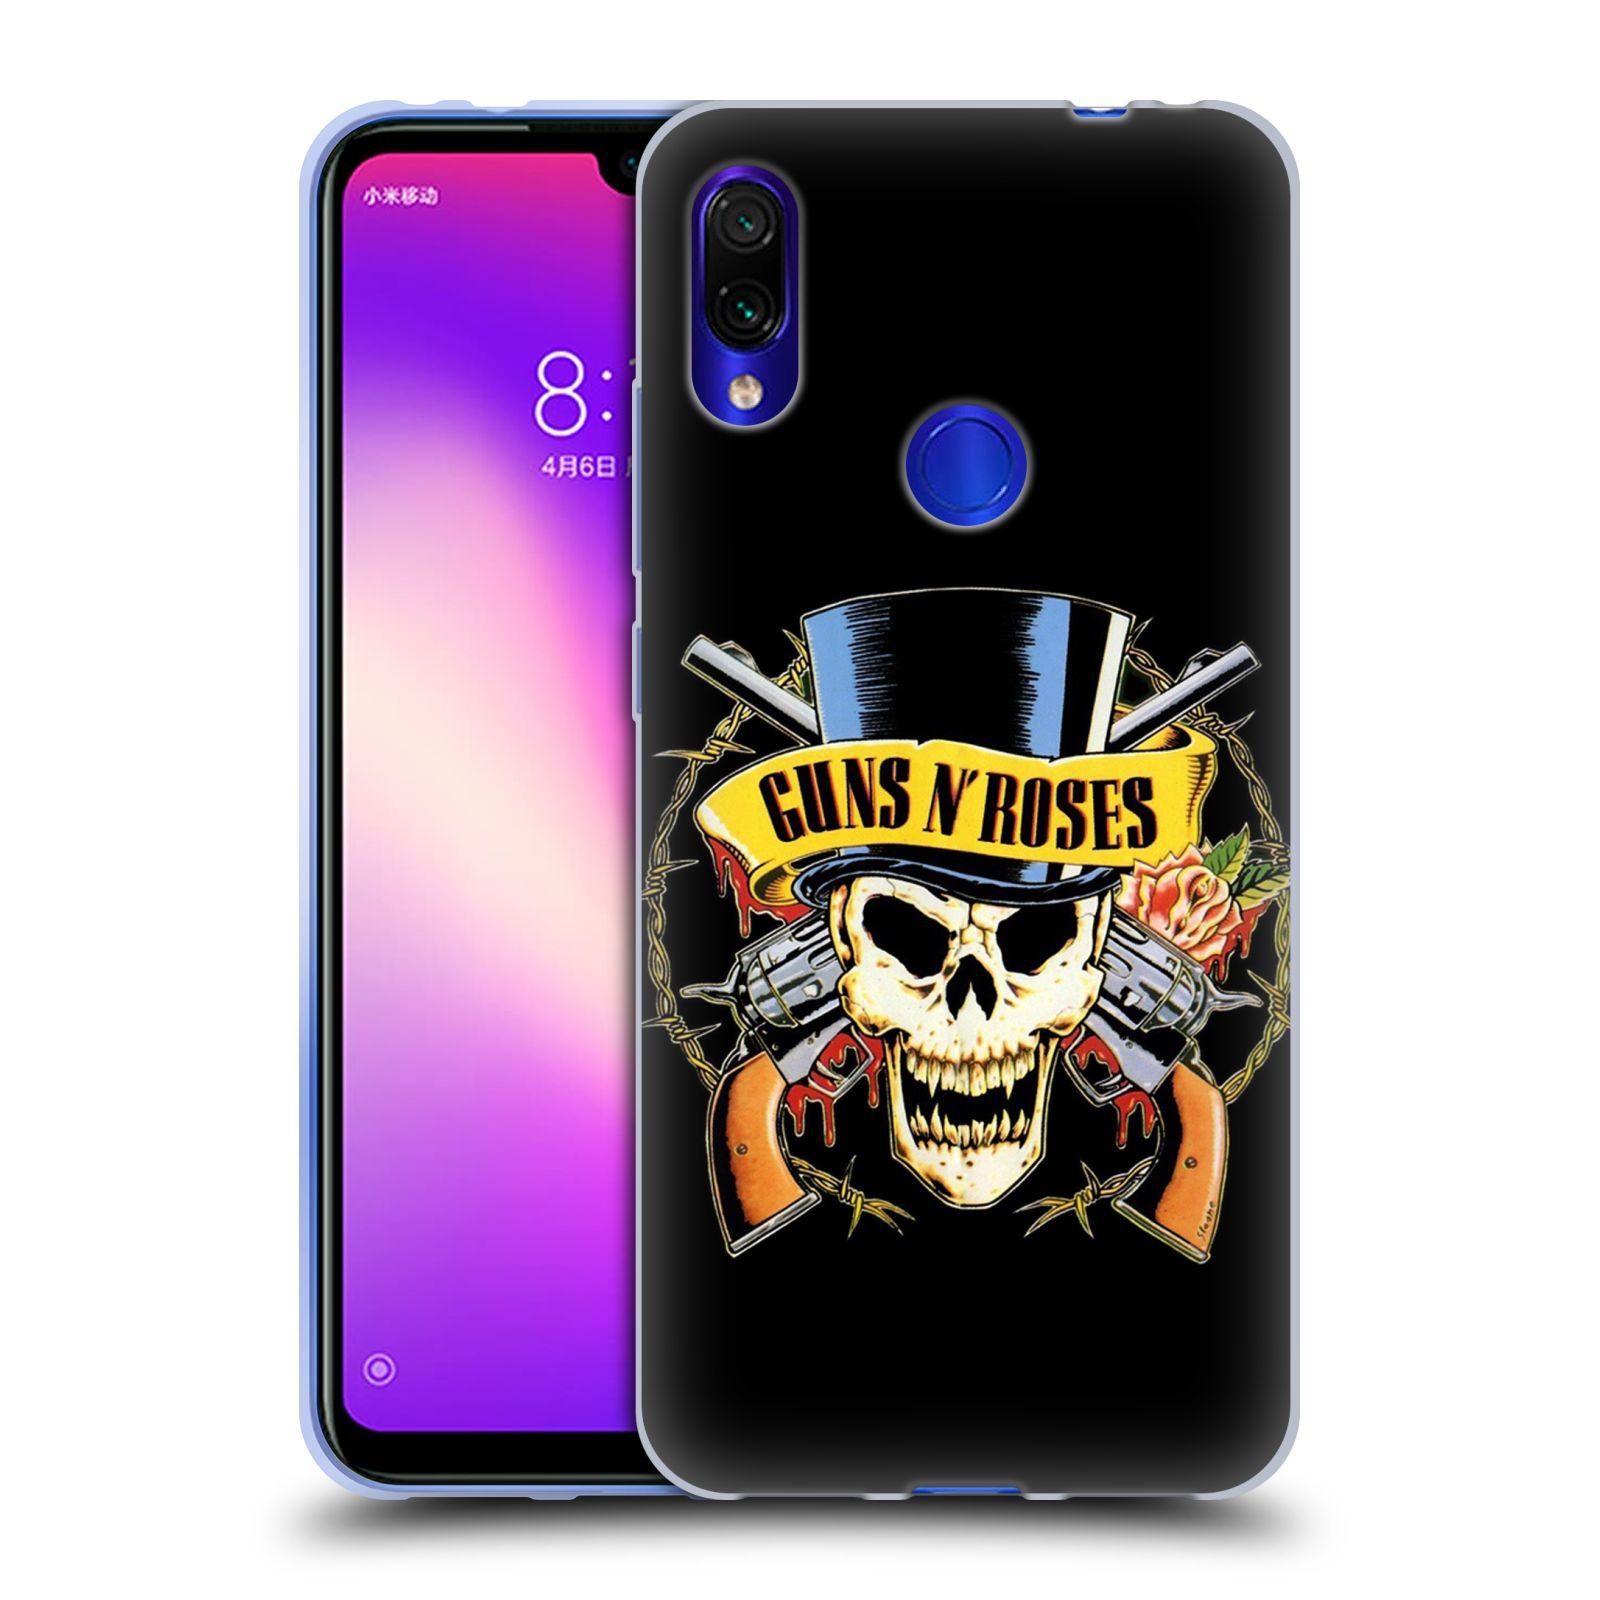 Silikonové pouzdro na mobil Xiaomi Redmi Note 7 - Head Case - Guns N' Roses - Lebka